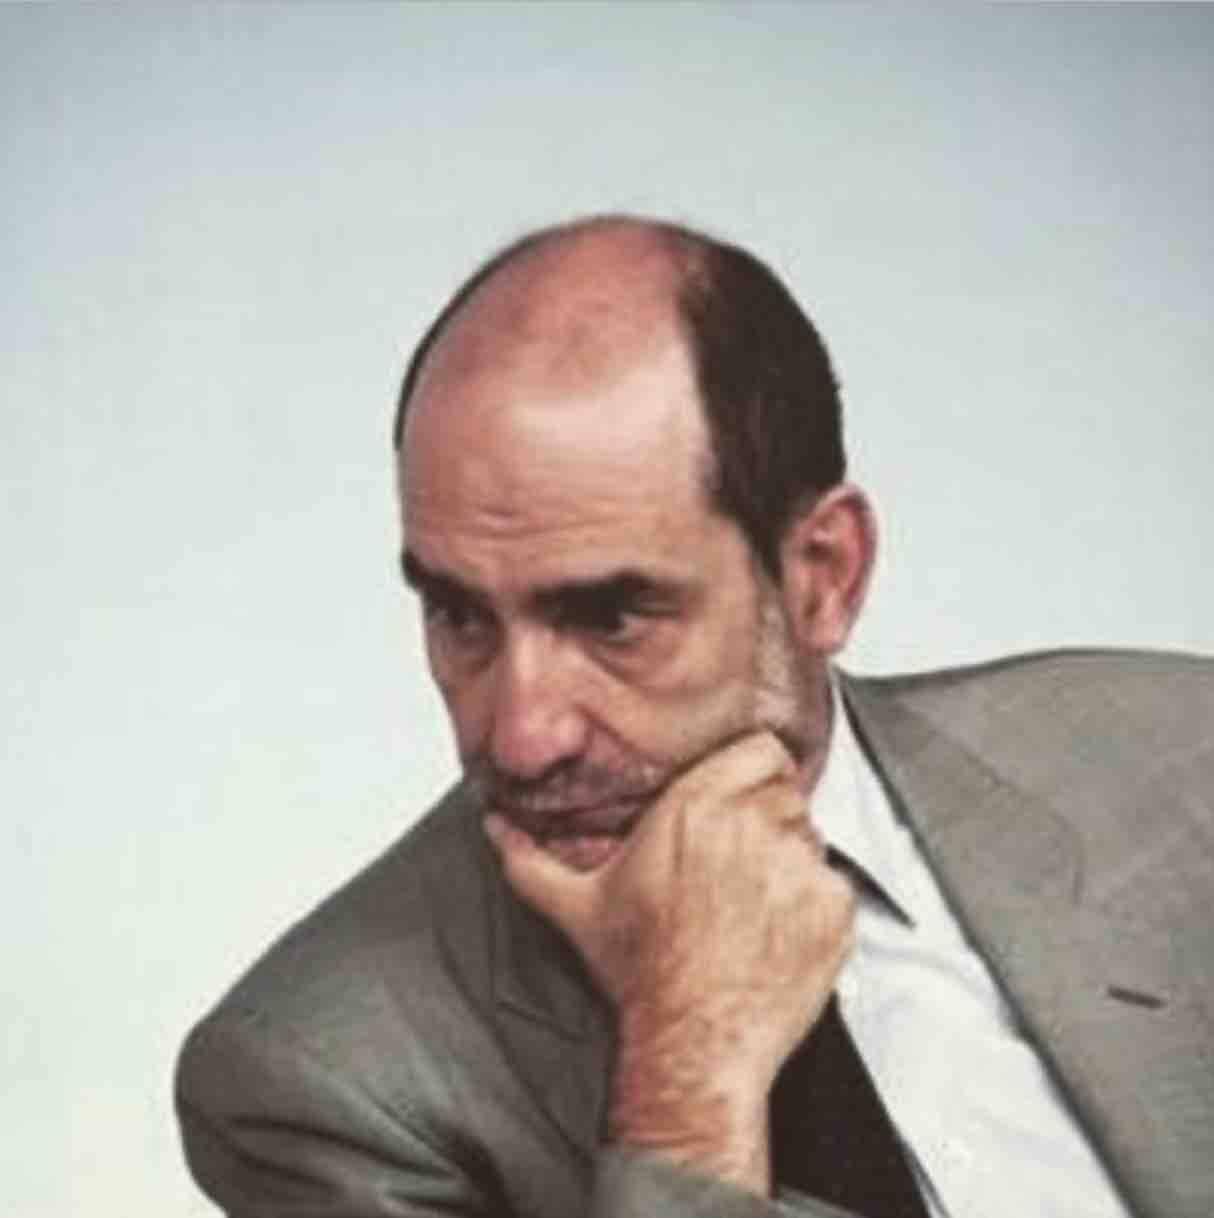 Giovanni Grasso Twitter